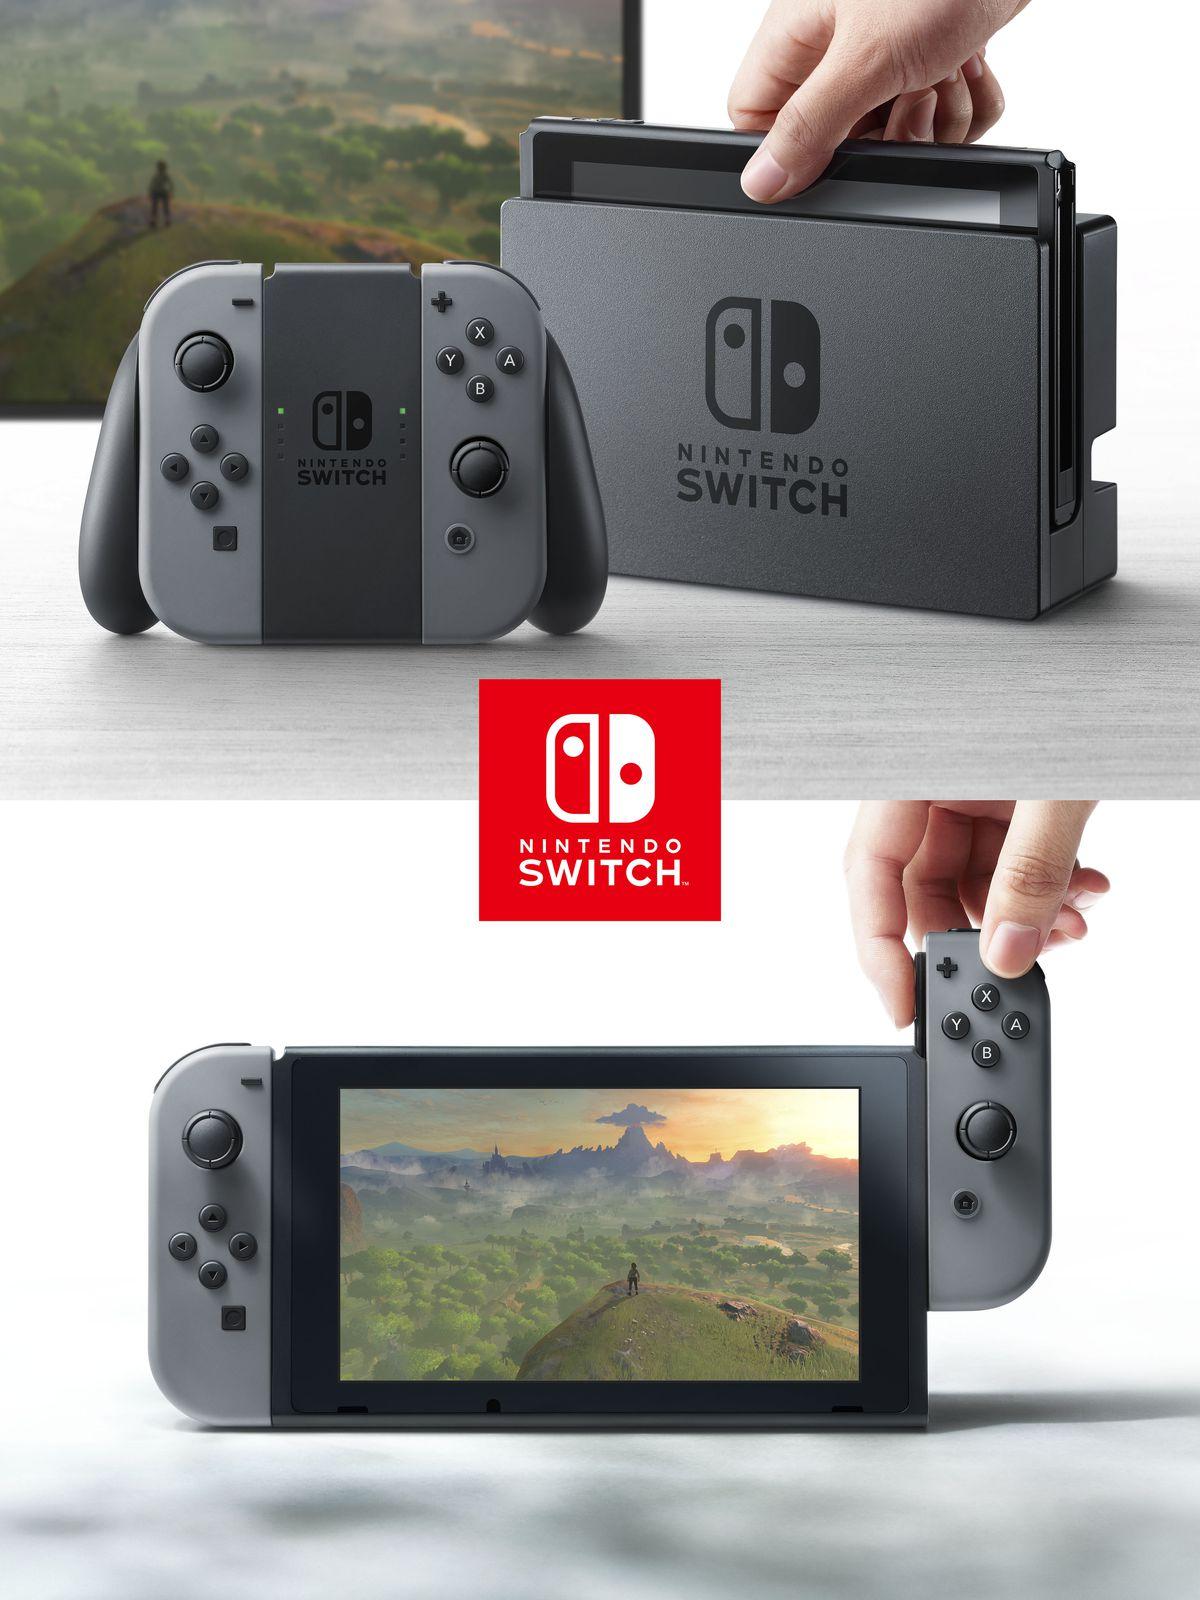 nintendo switch press image 1